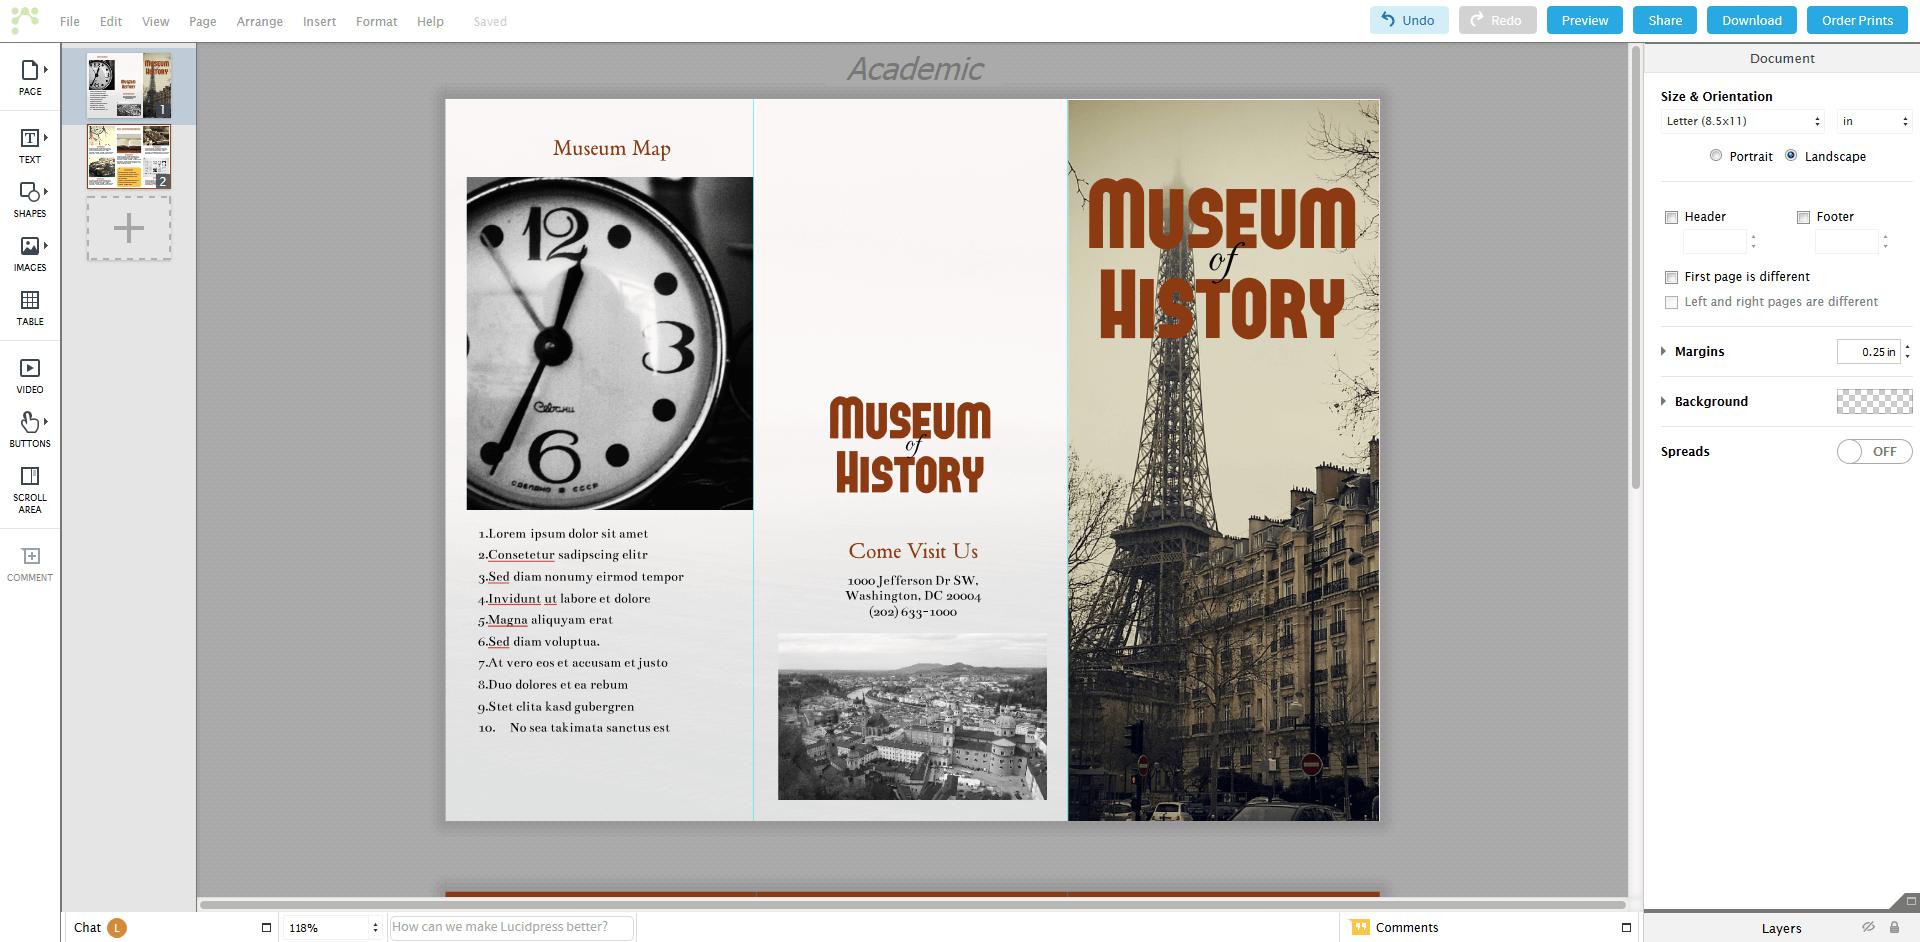 Free alternatives to Adobe InDesign - 1&1 IONOS